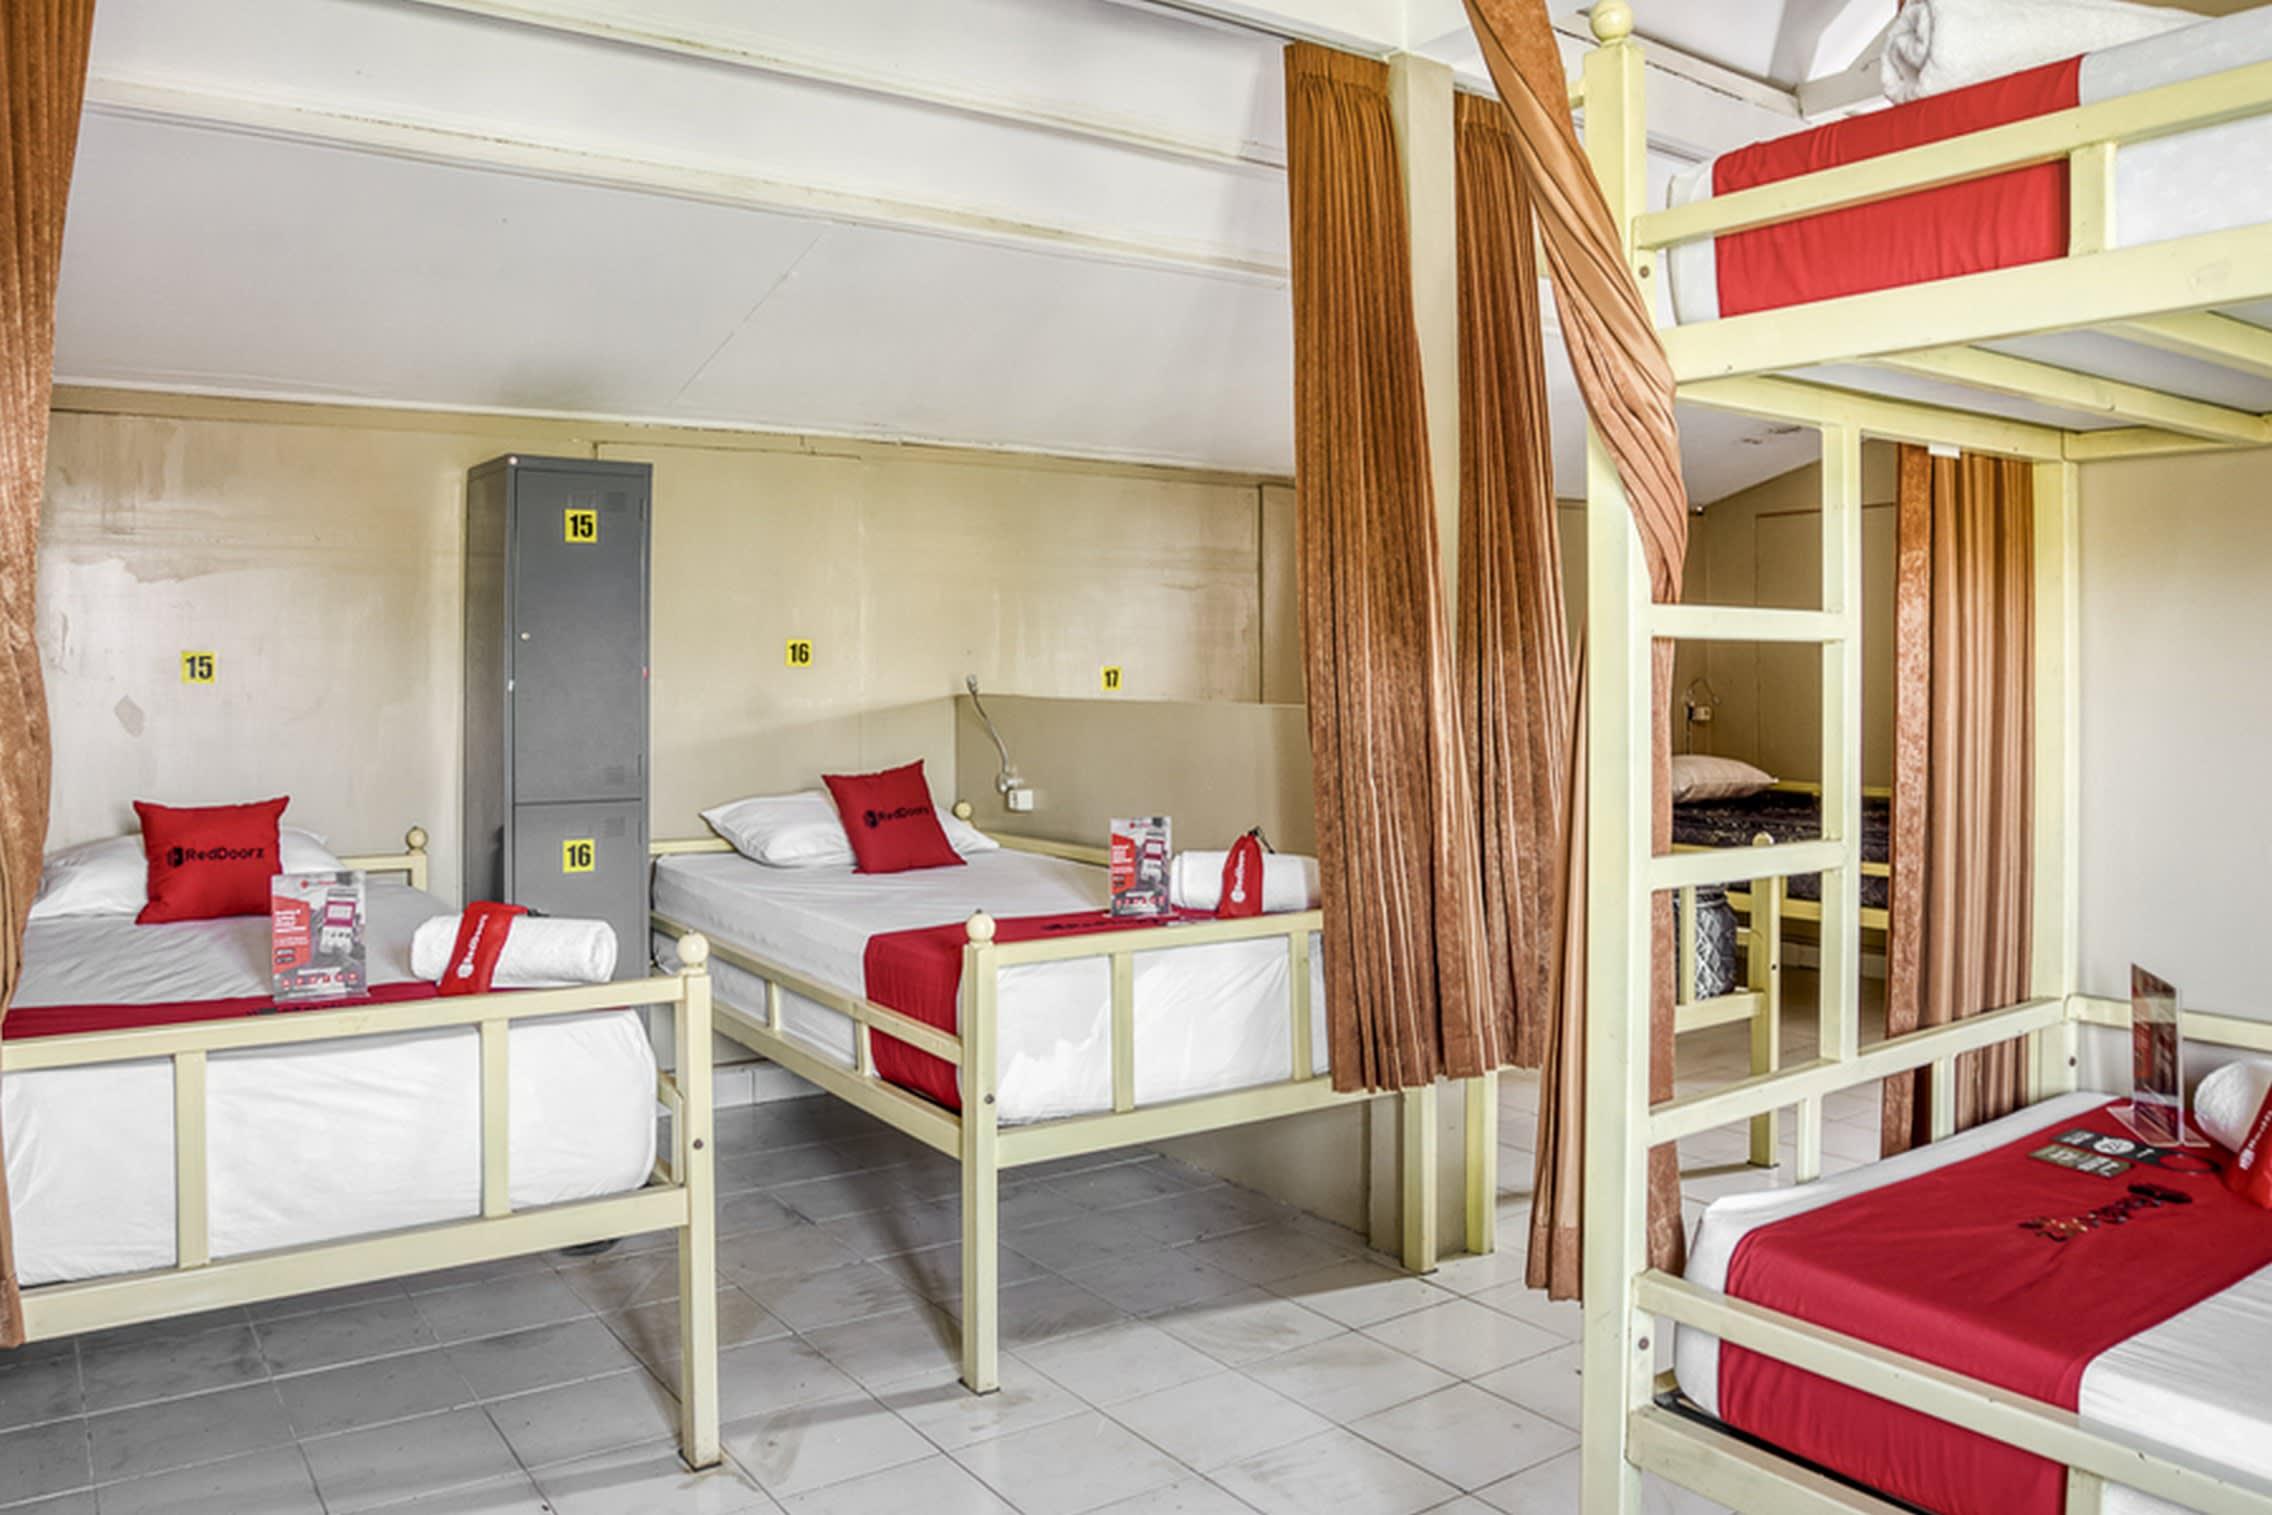 HOSTEL - RedDoorz Hostel near Ubud Palace